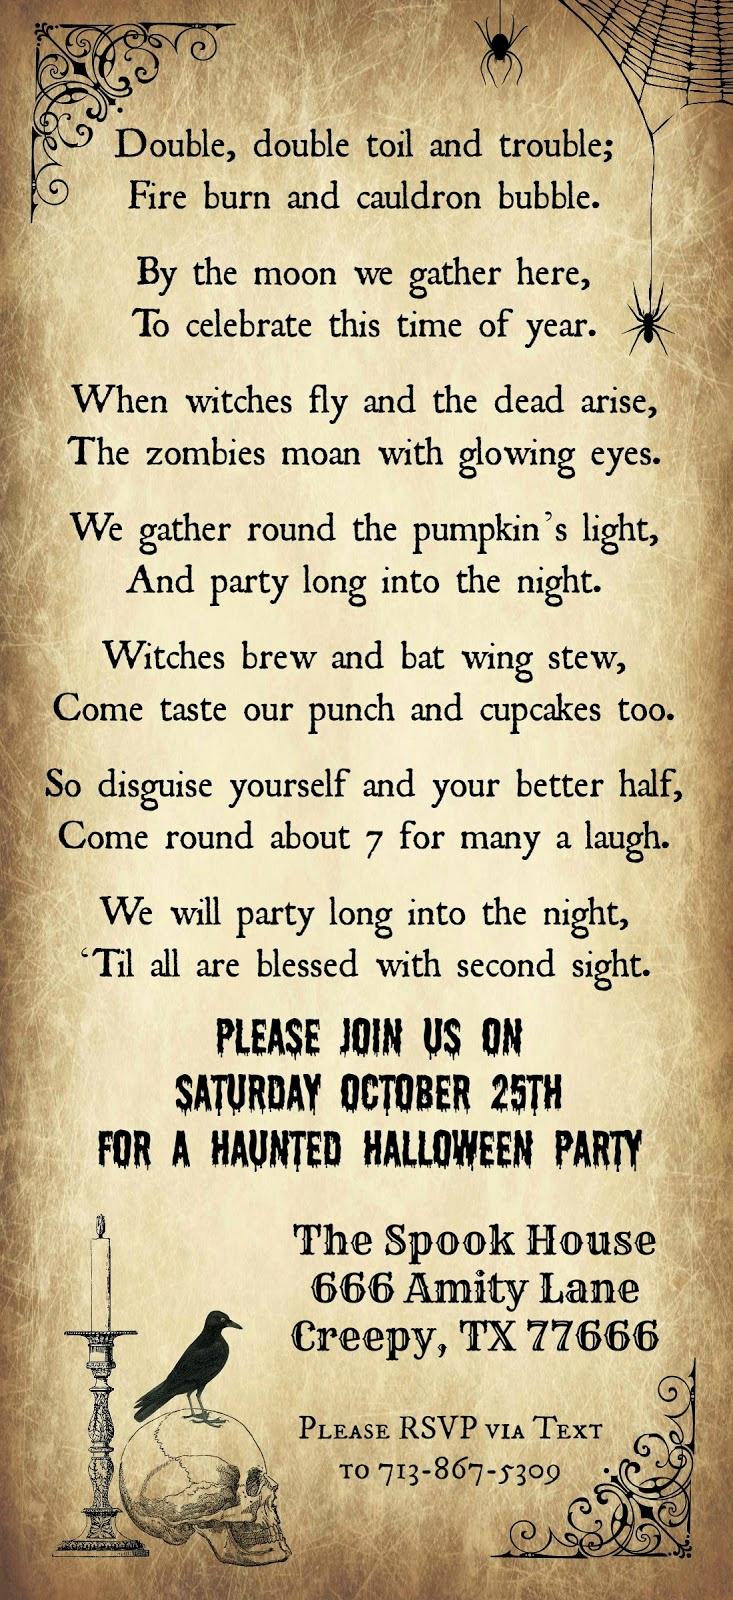 Halloween Party Invitations Templates Unique Crafty In Crosby Halloween Party Invitation 2014